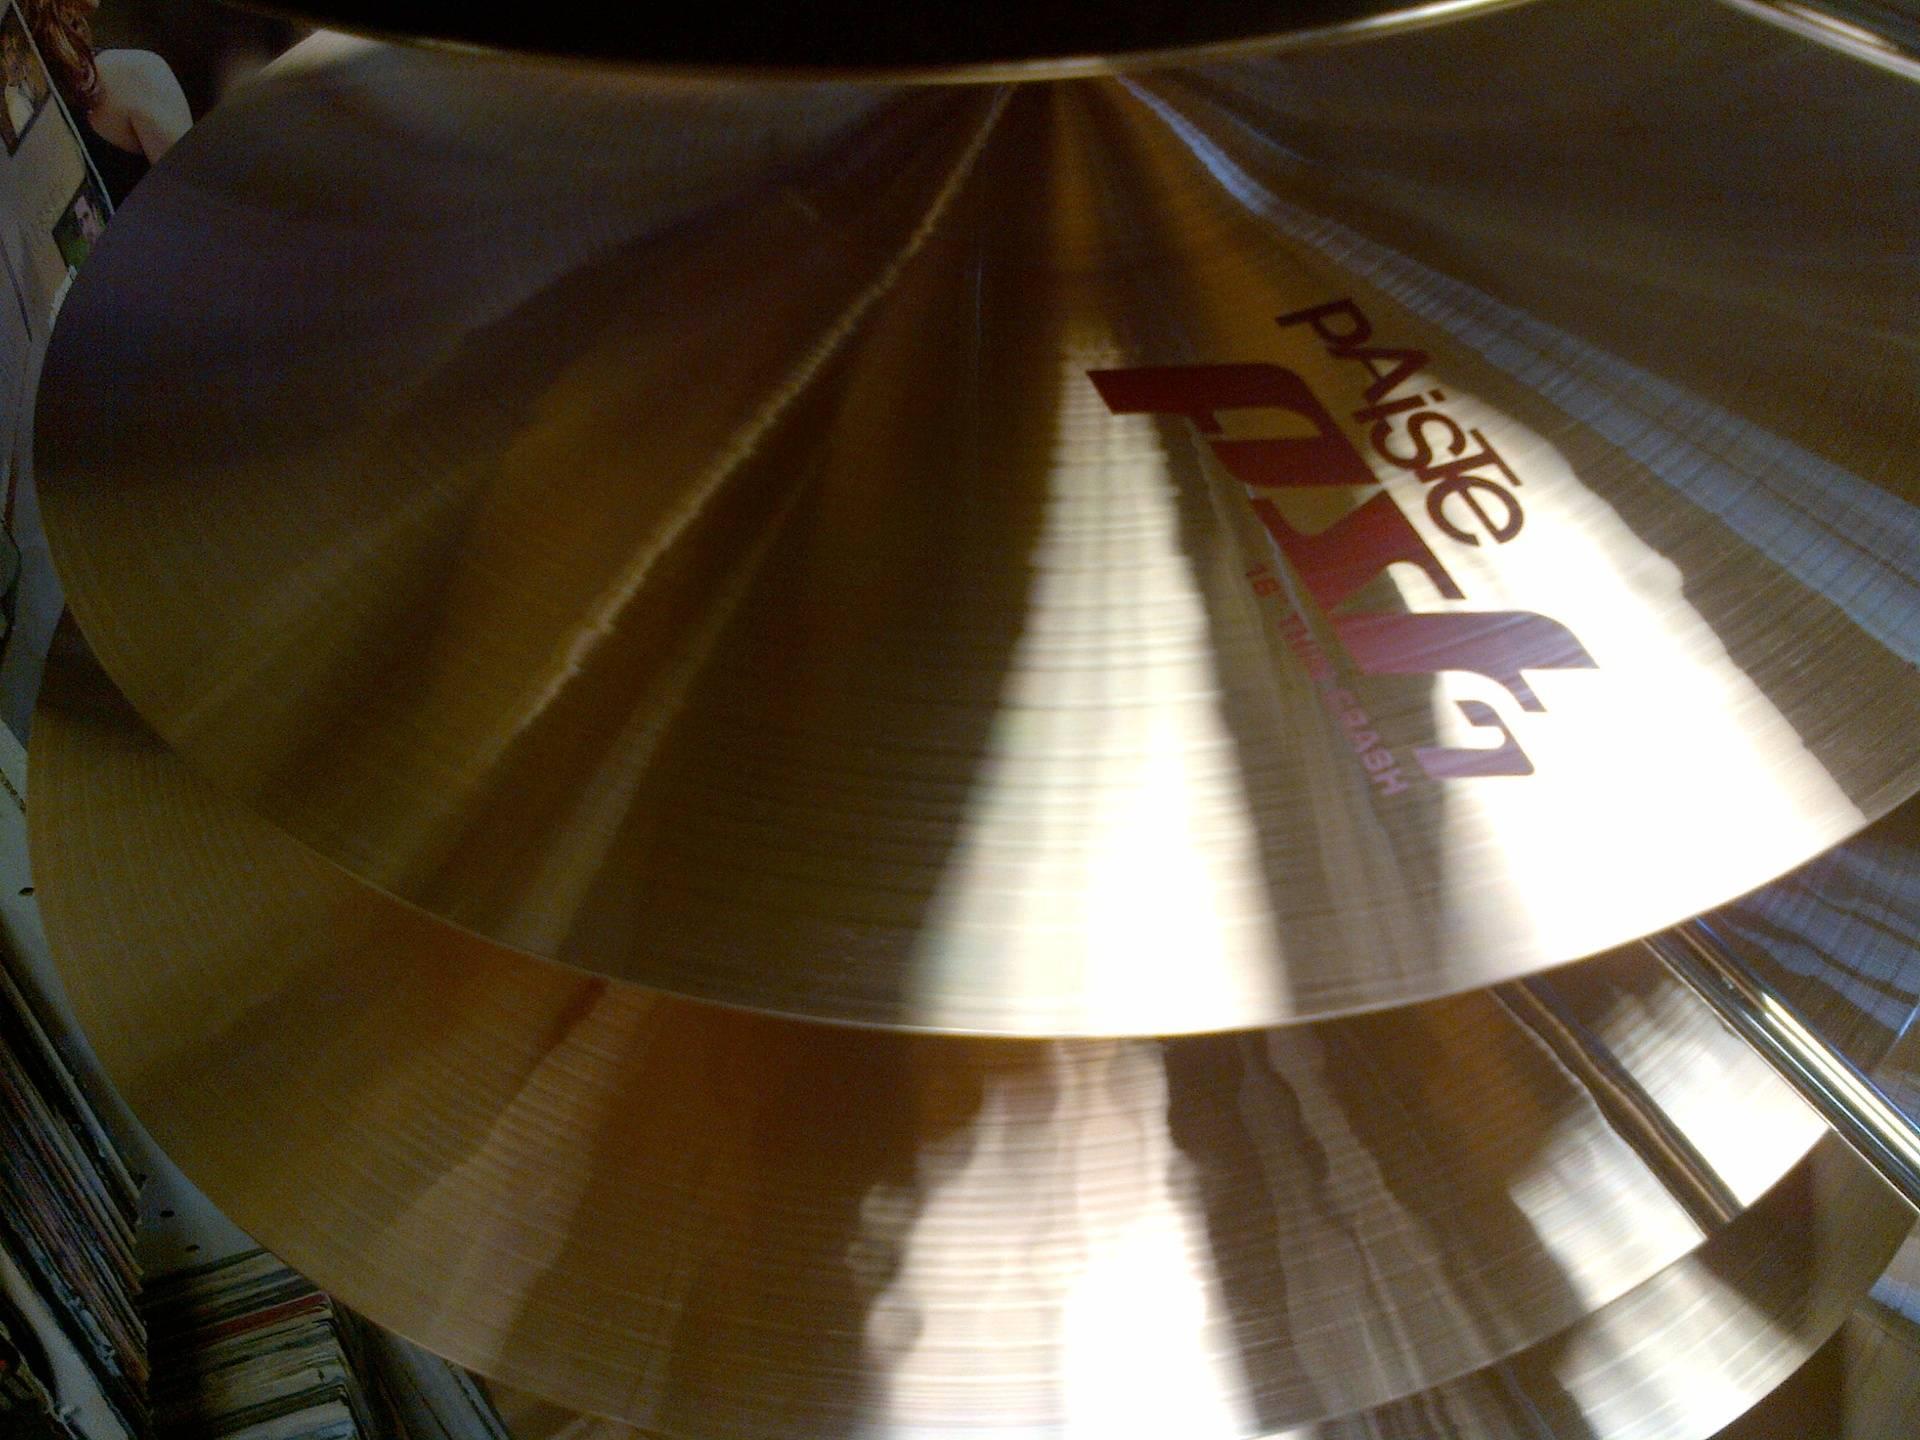 New Paiste7 Cymbals